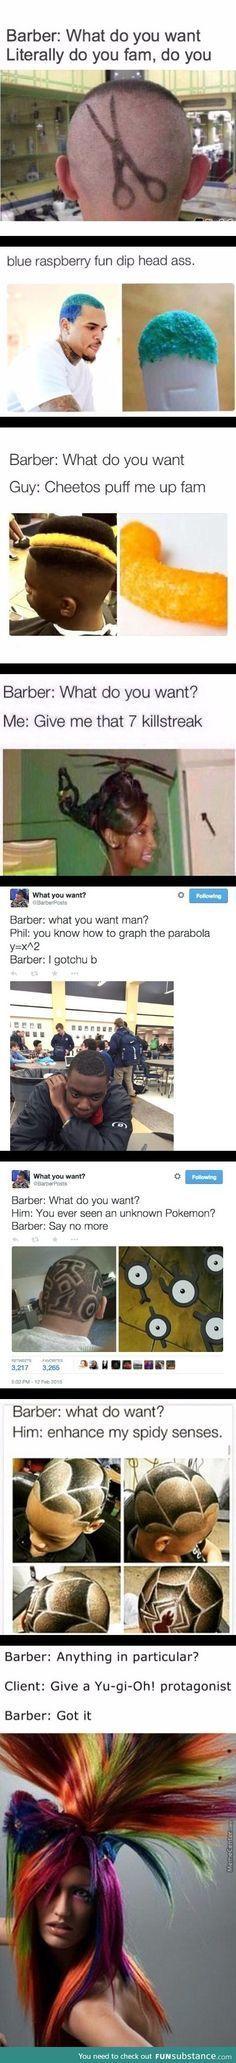 Barber meme comp.